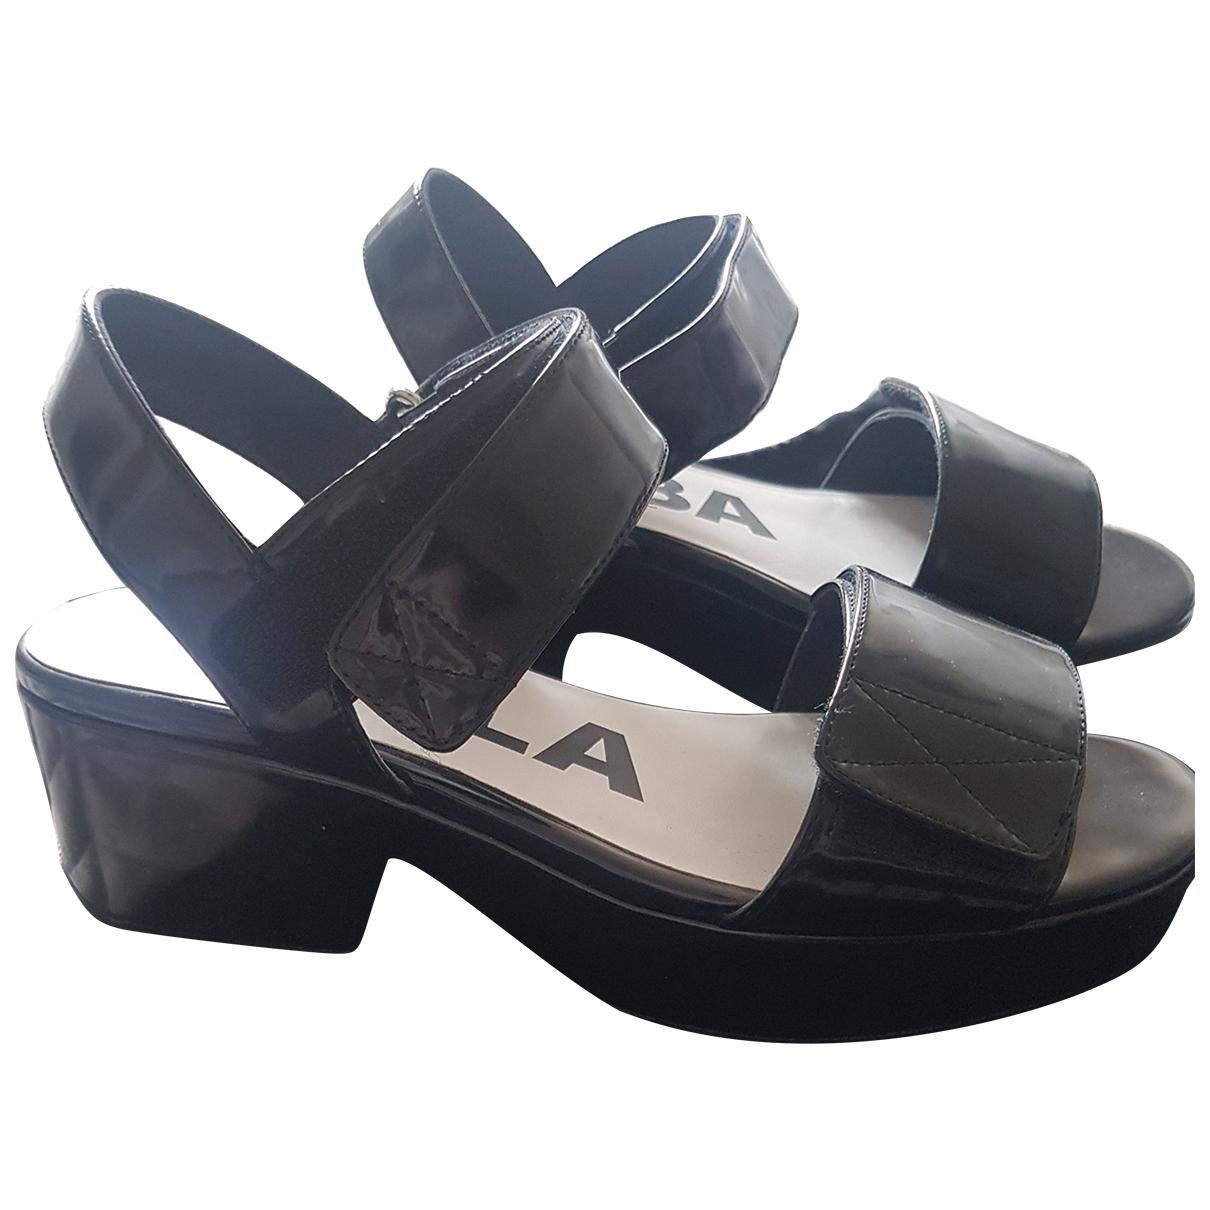 Bimba Y Lola N Black Patent leather Sandals for Women 41 EU